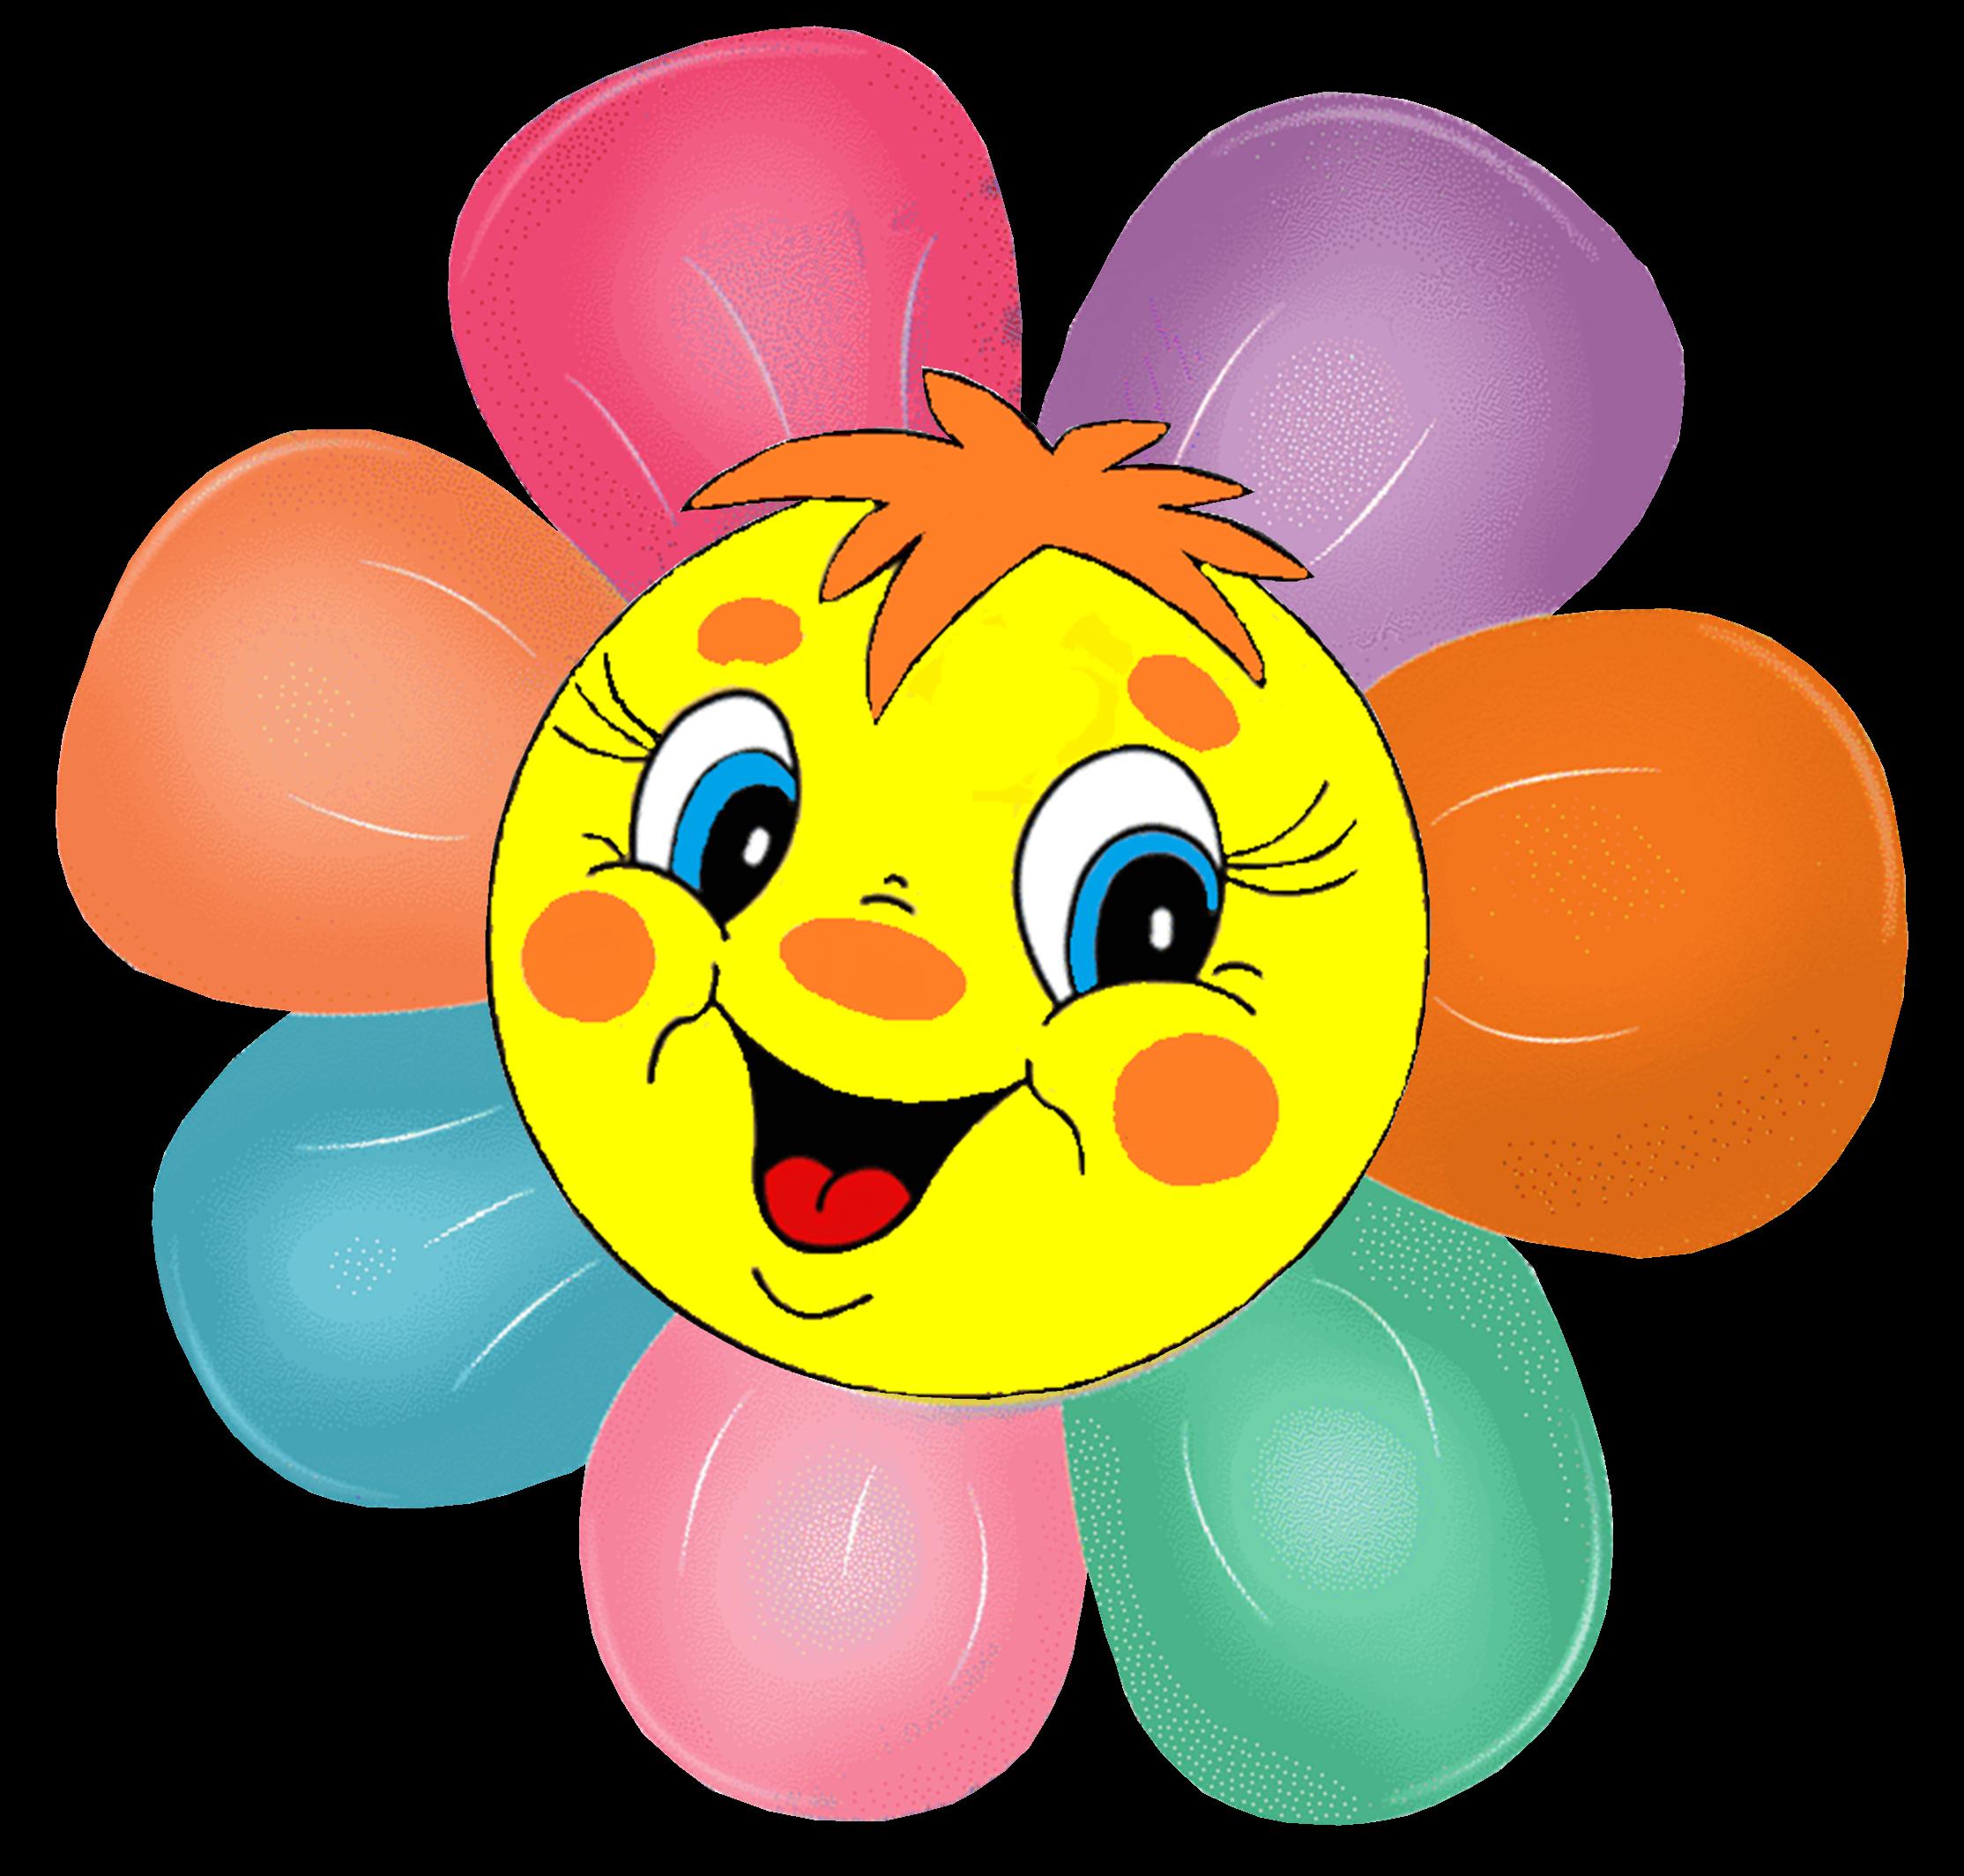 Sun clipart 3d vector stock клипарт солнышко - Google Търсене | ПЪРВА ГРУПА | Pinterest | Emojis ... vector stock